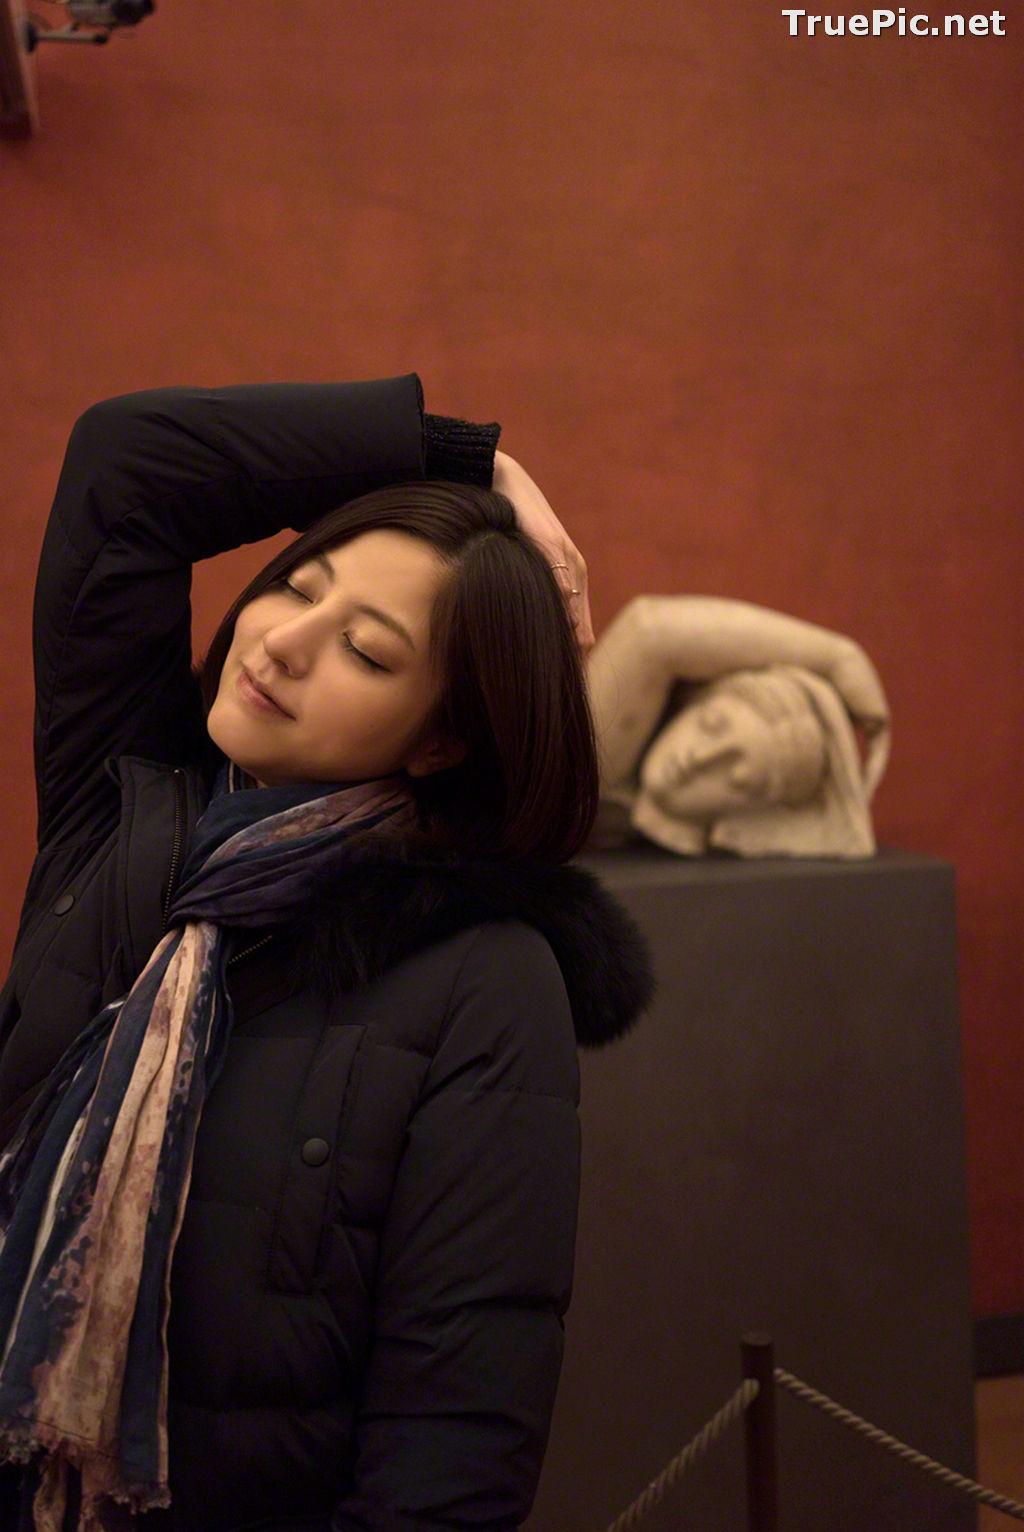 Image Wanibooks No.136 - Japanese Actress and Singer - Yumi Sugimoto - TruePic.net - Picture-8